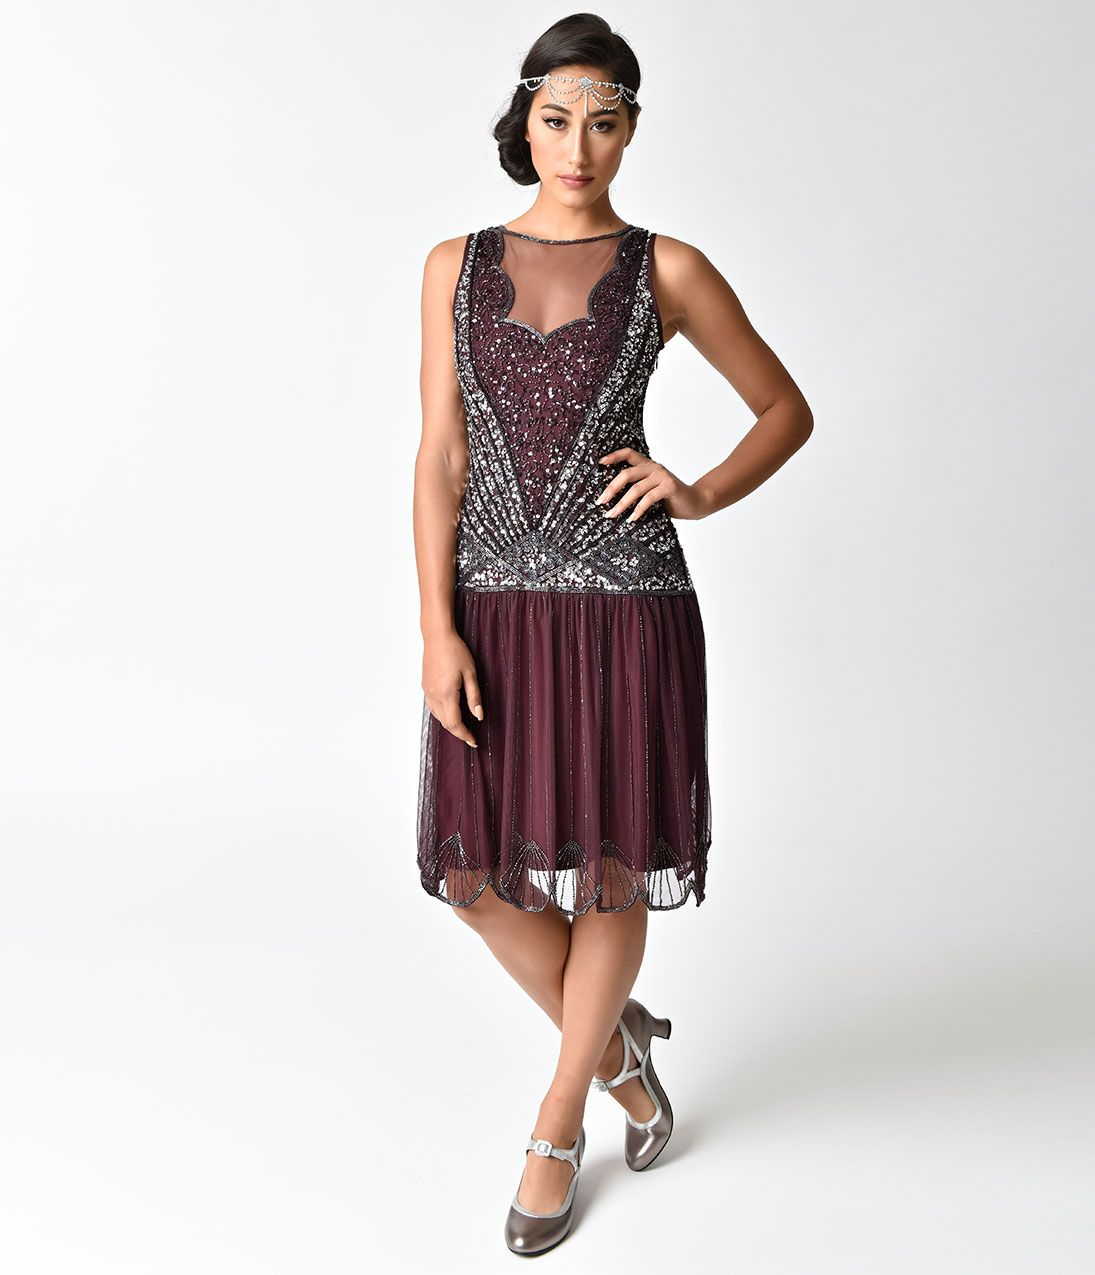 1920s Evening Dresses & Formal Gowns 1920s evening dress